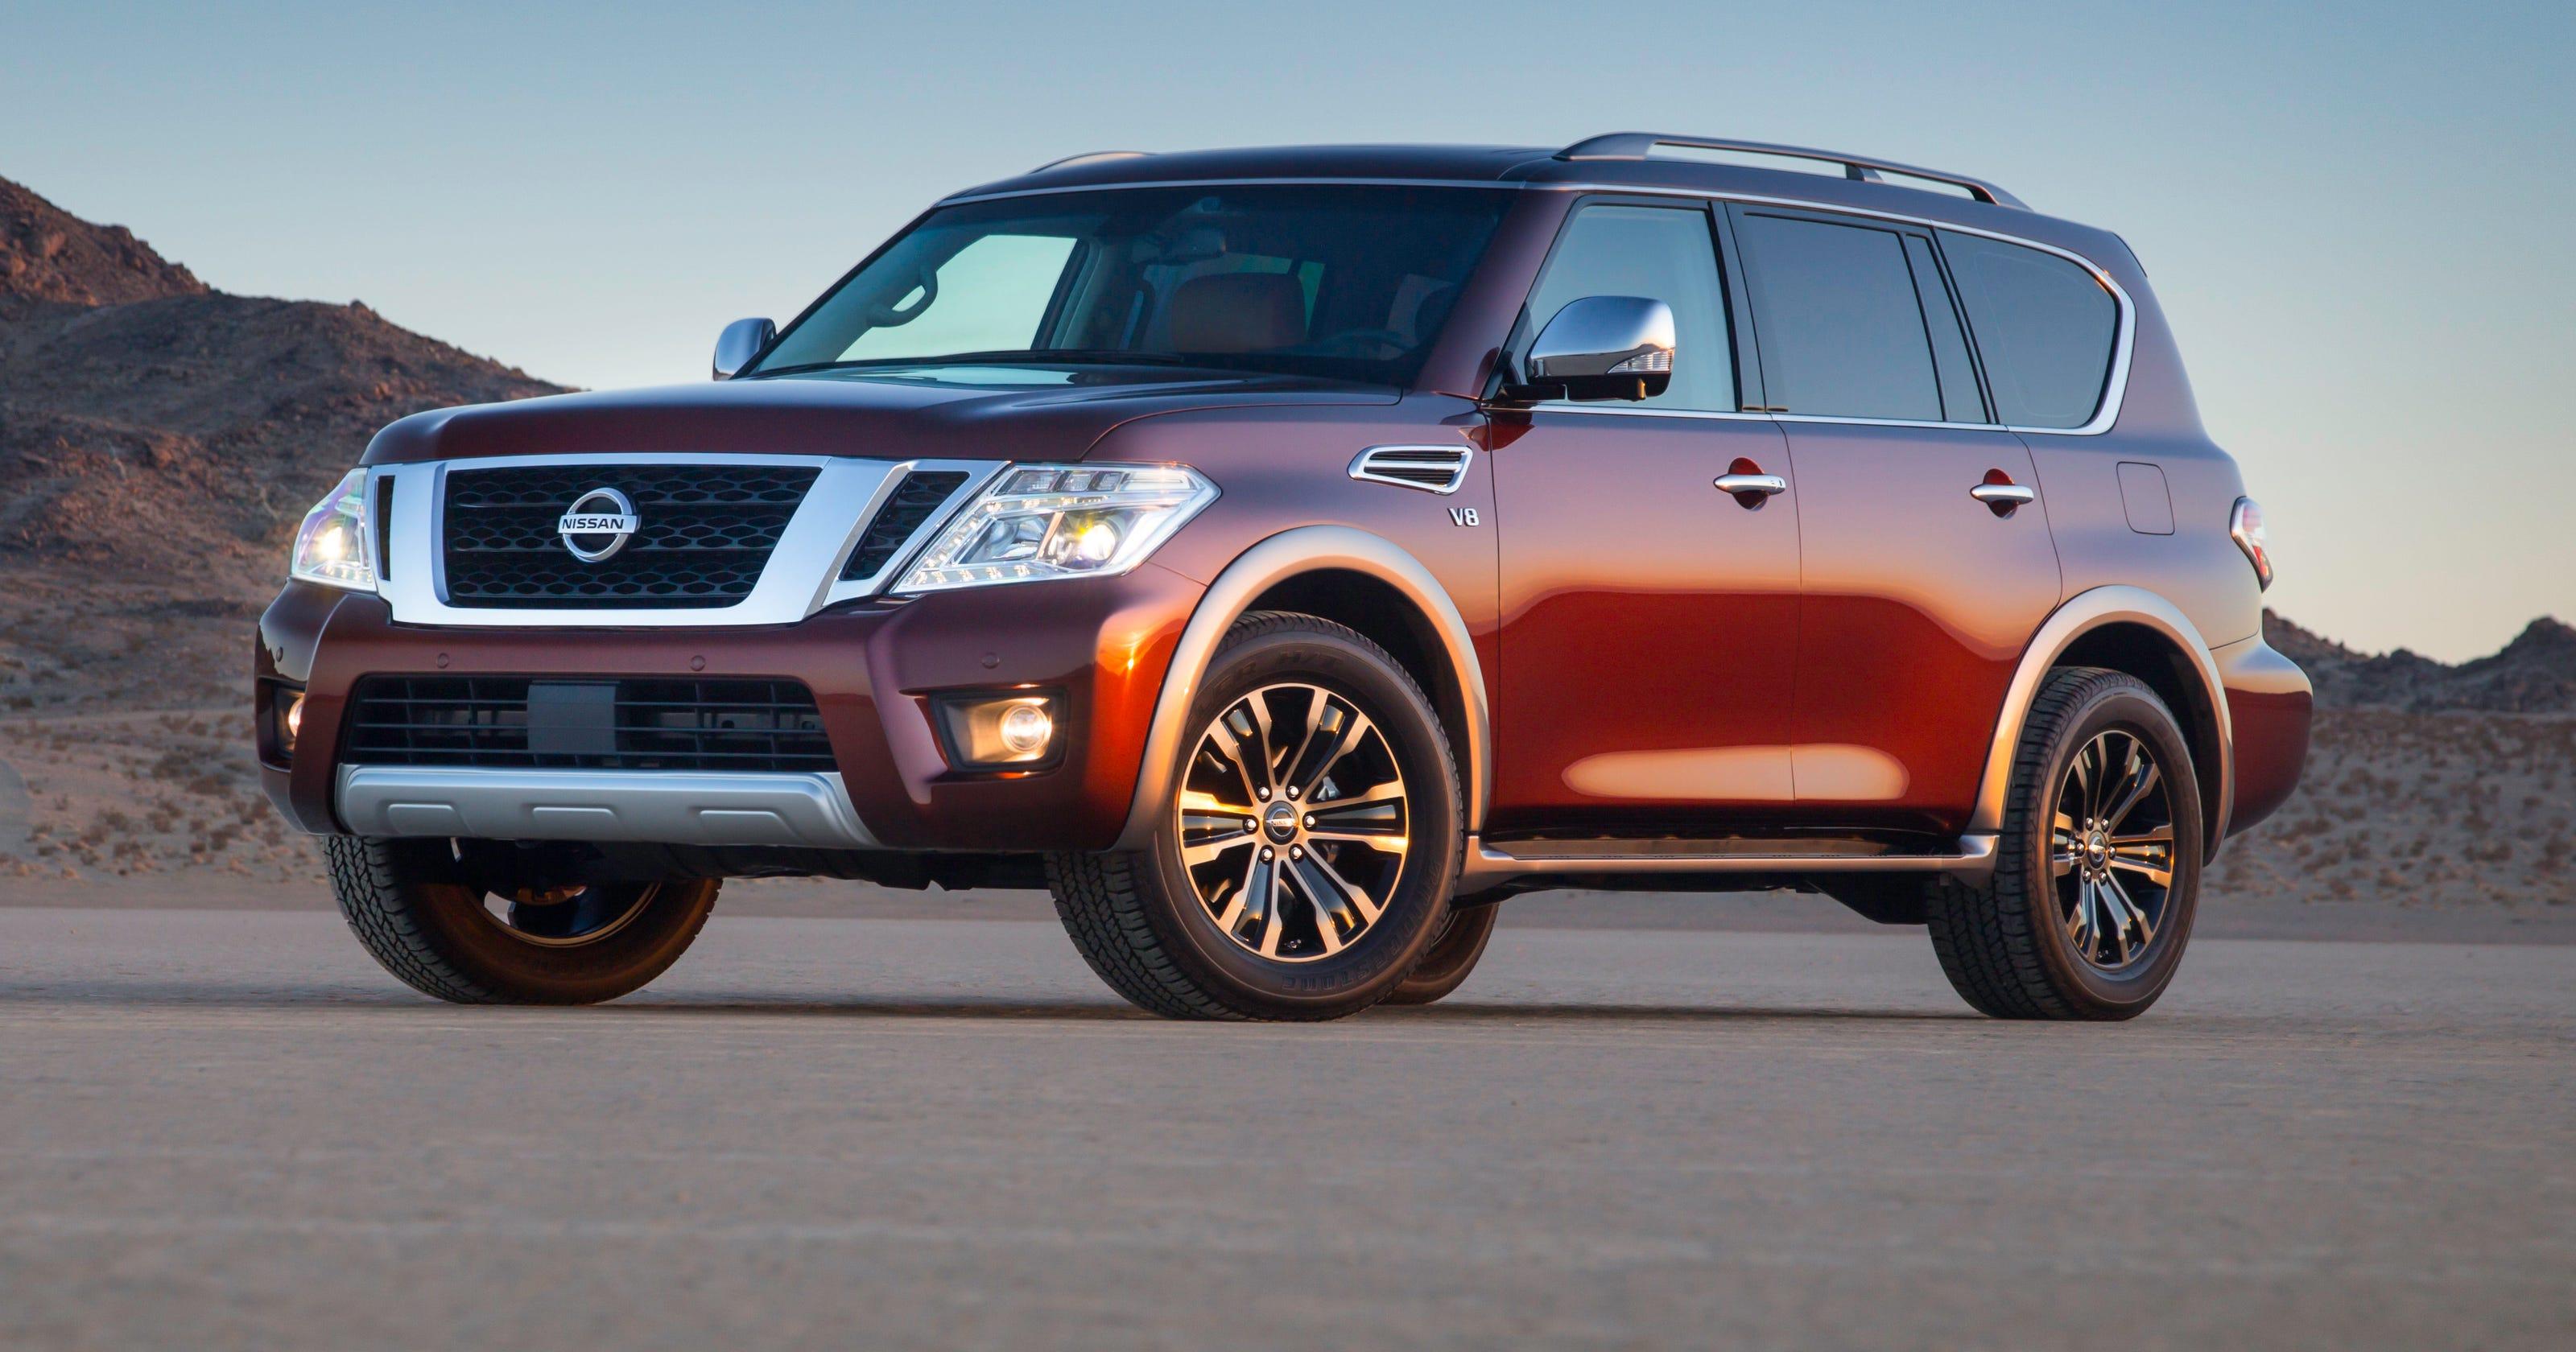 Nissan Showed New Longer 2017 Armada Suv